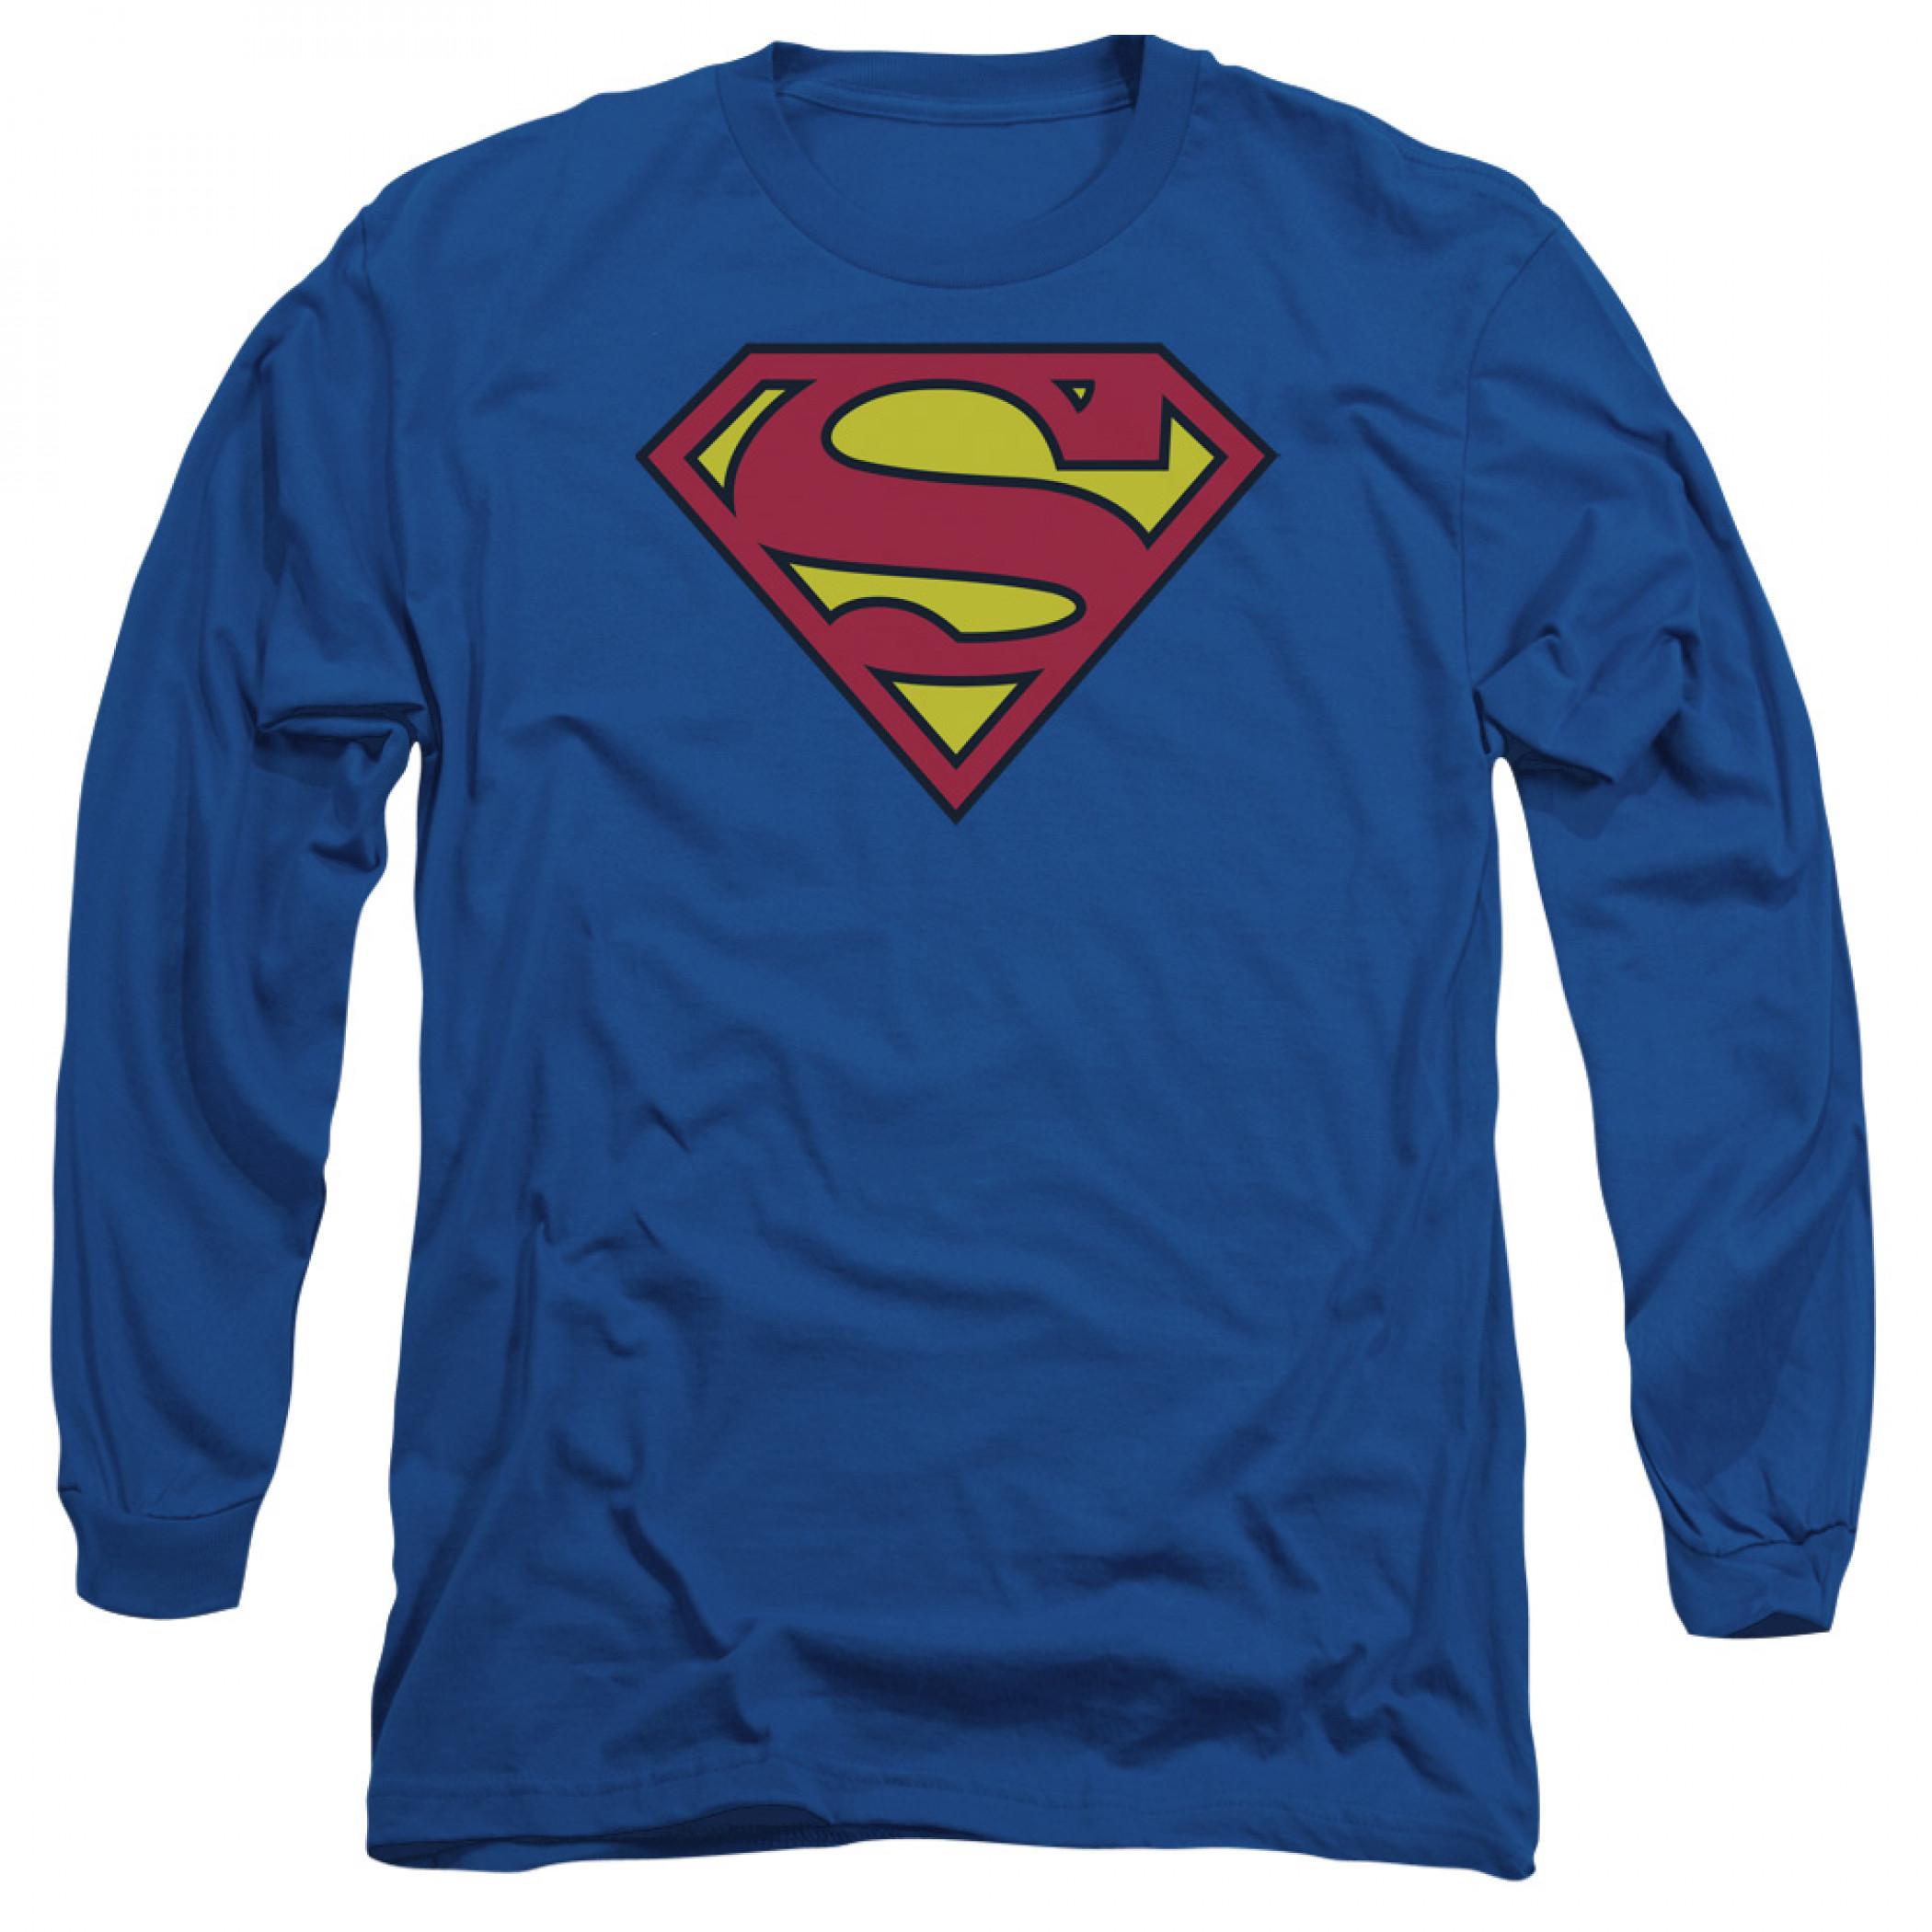 Superman Symbol Shirt Royal Blue Long-Sleeve